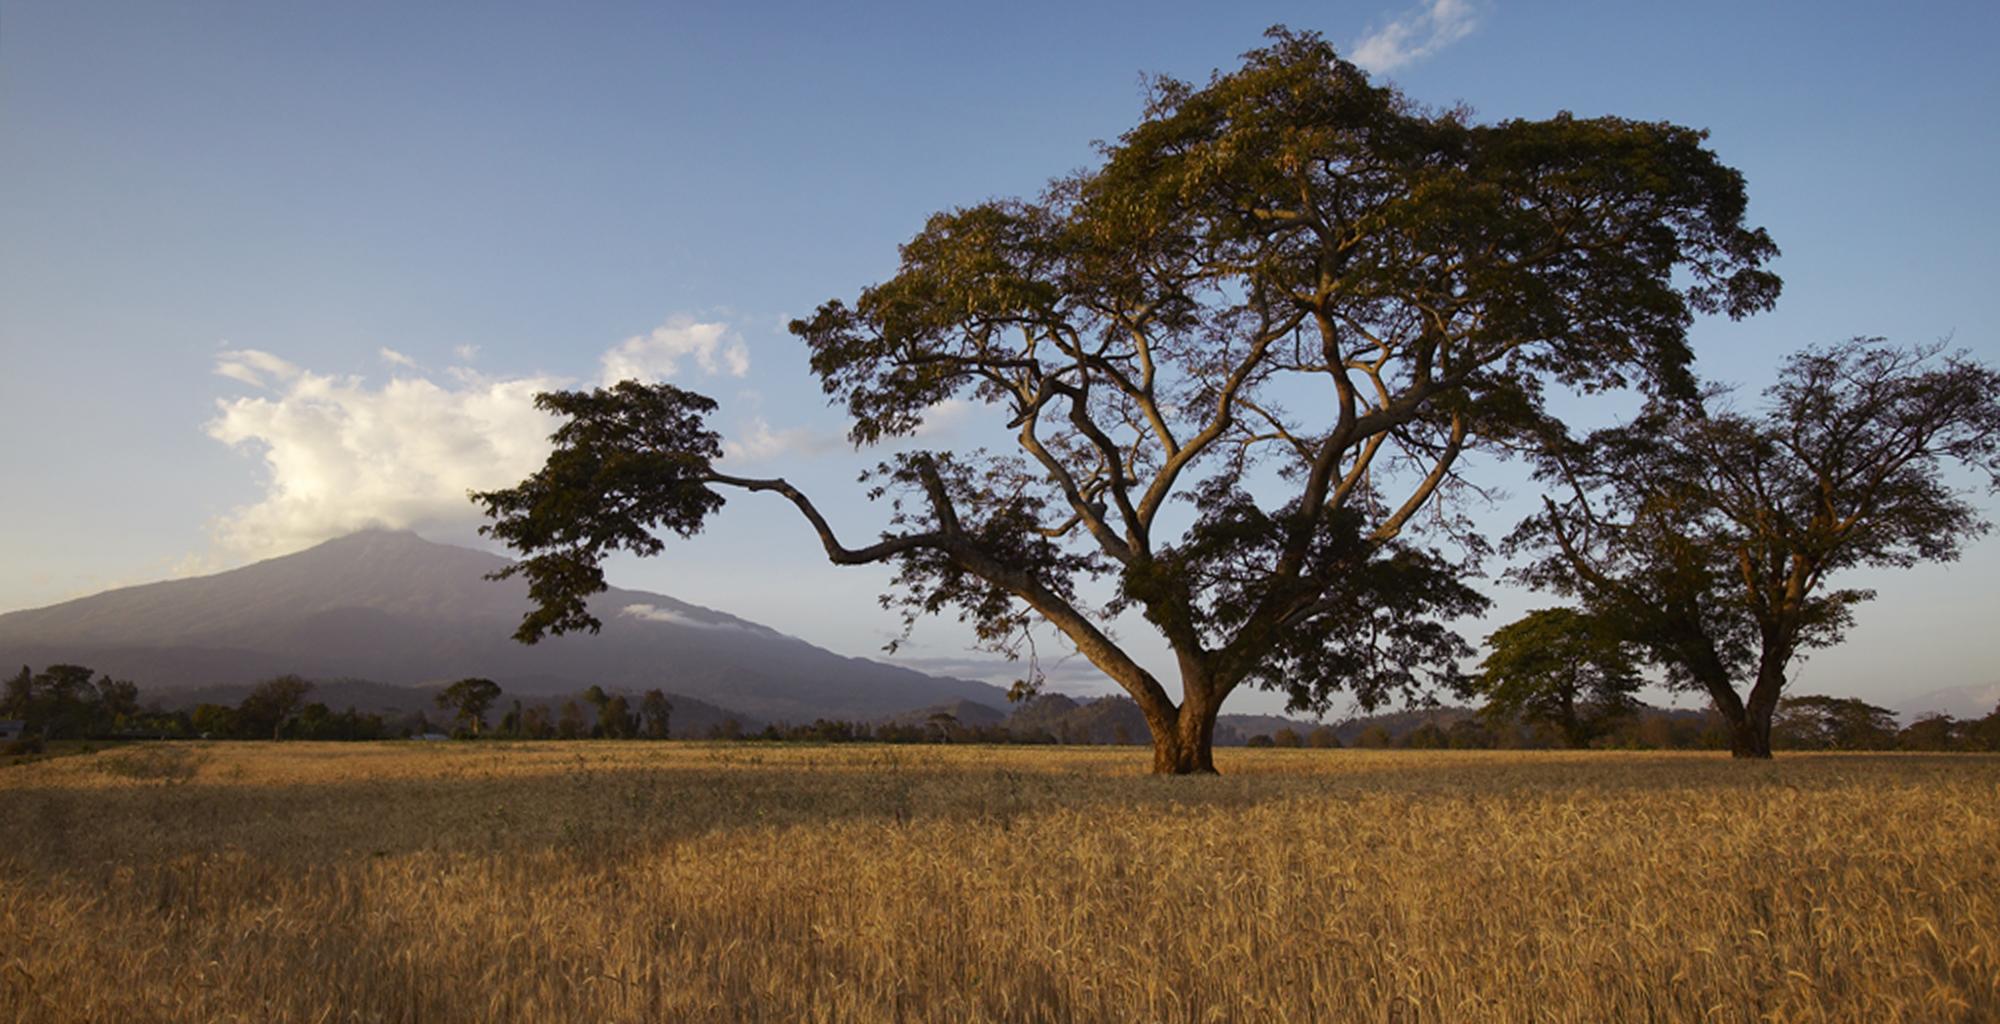 Tanzania-Kigongoni-Surroundings